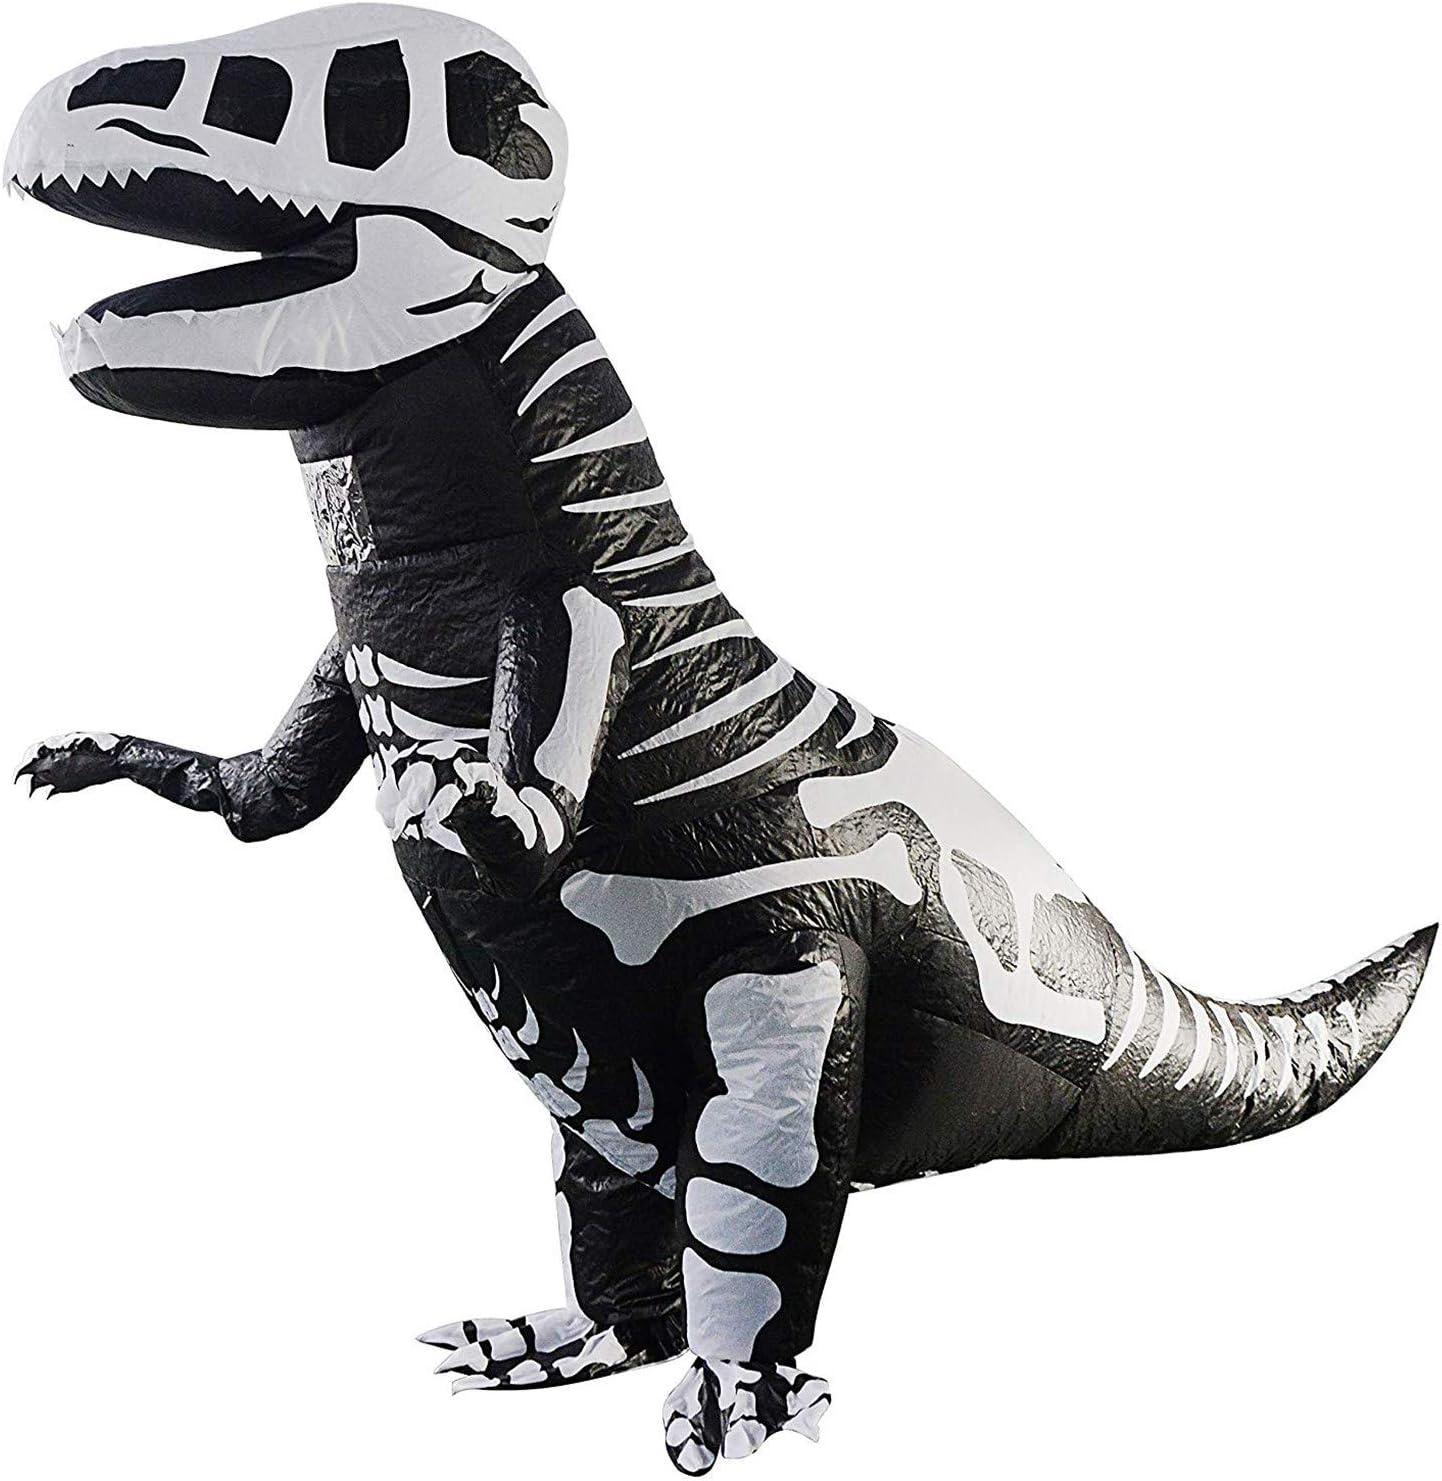 WOVELOT Disfraz de Dinosaurio Inflable de Esqueleto Gigante T-Rex Blow Up Dino Costume Adult